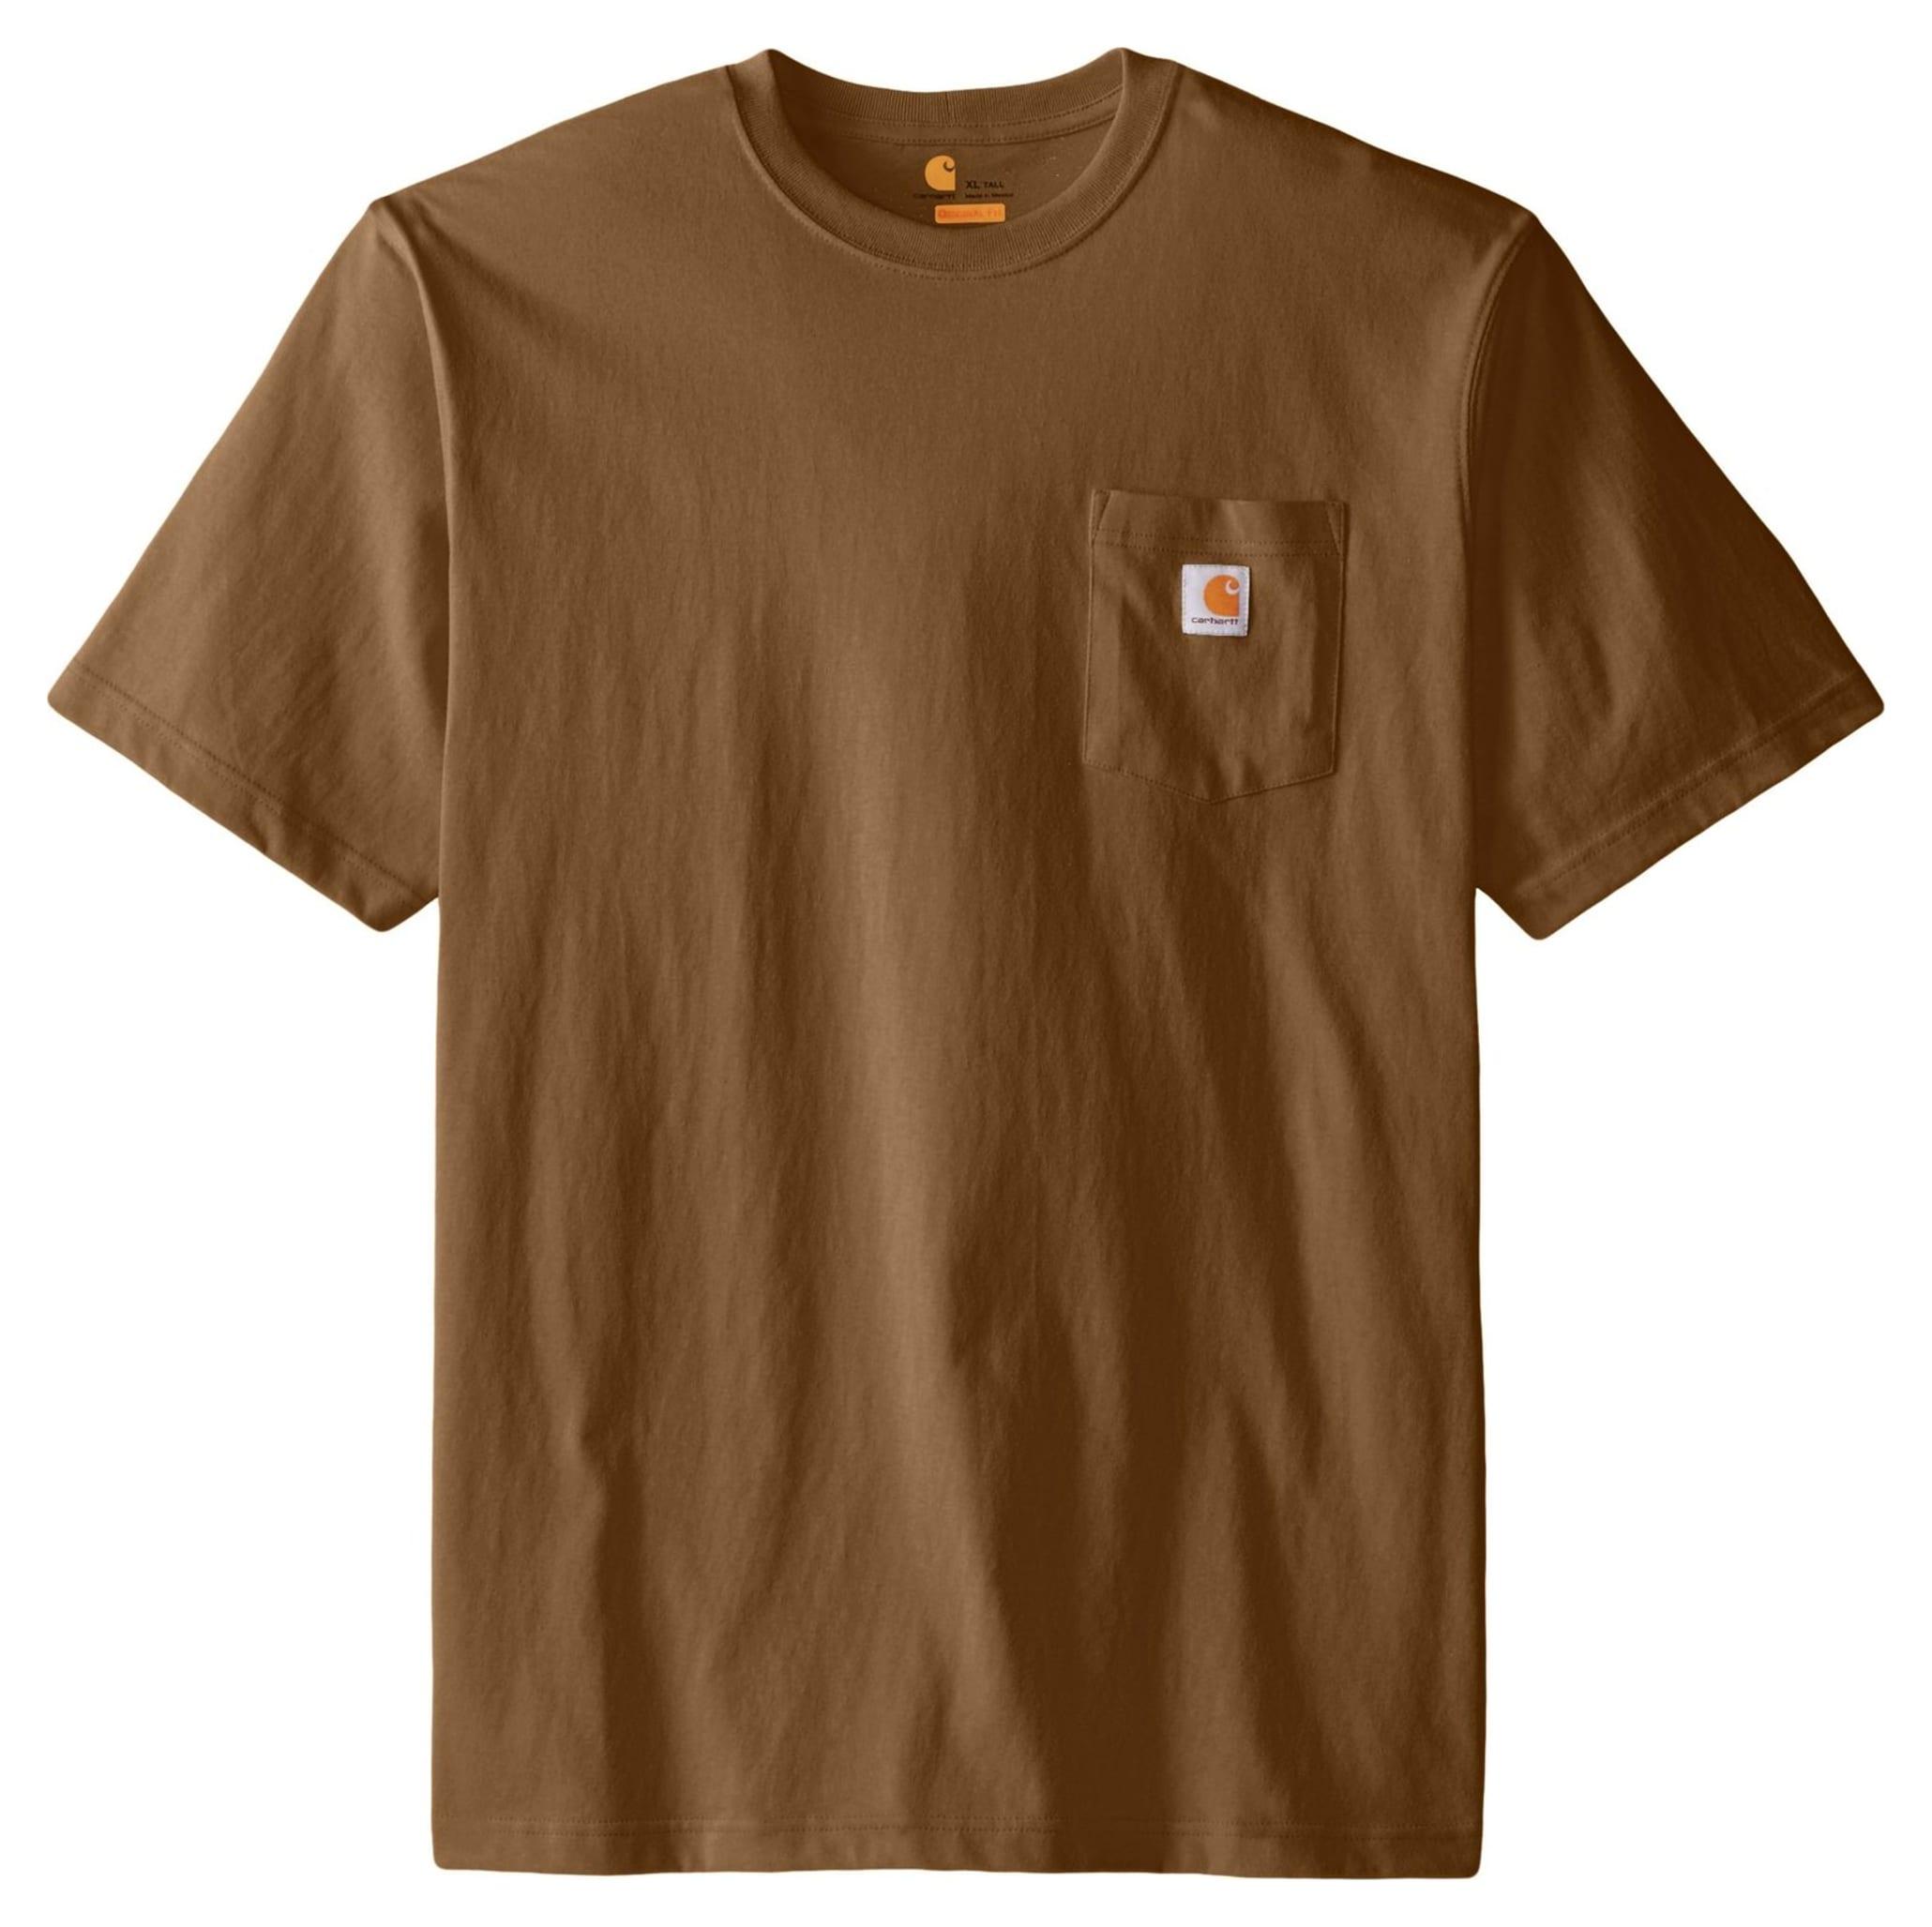 Carhartt Men 39 S Workwear Pocket T Shirt Tall Brown Xxl